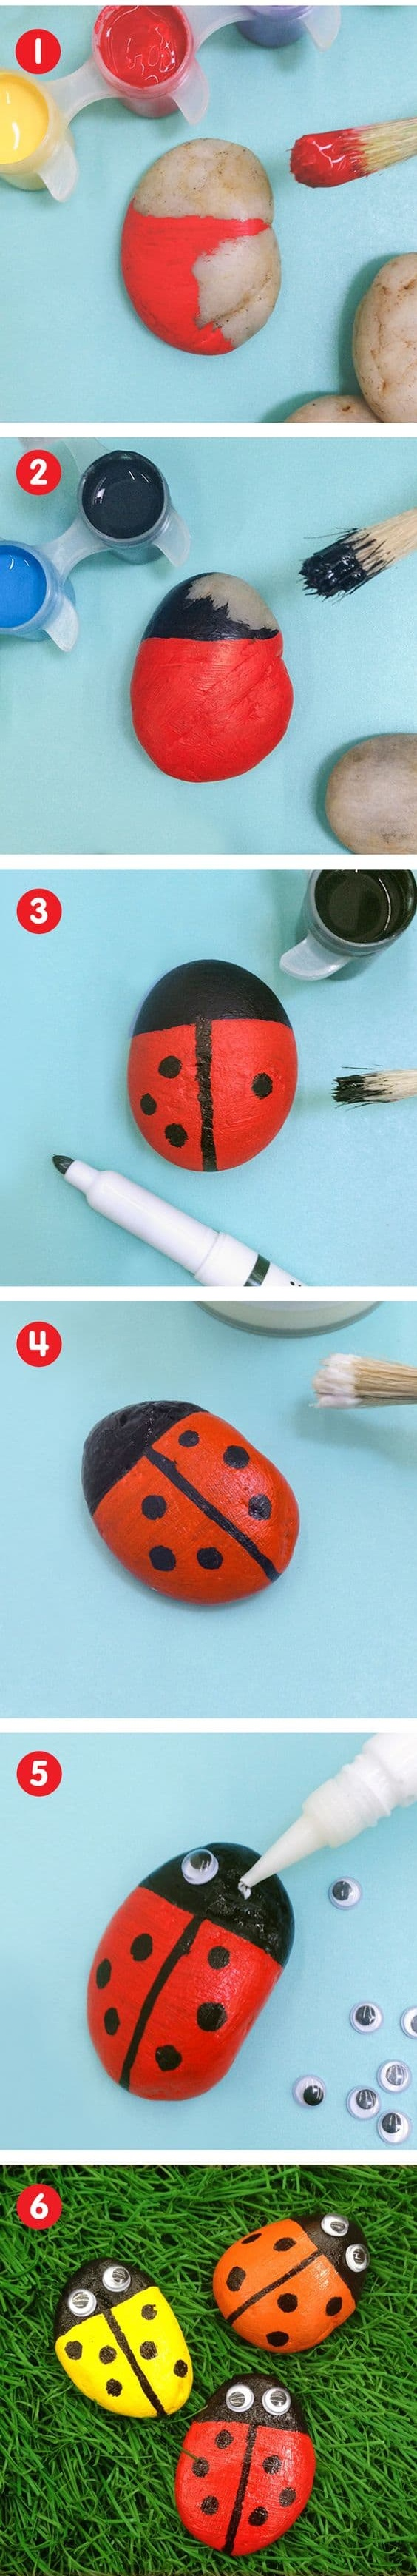 Ladybug Painted Rocks Ideas | How to Make It